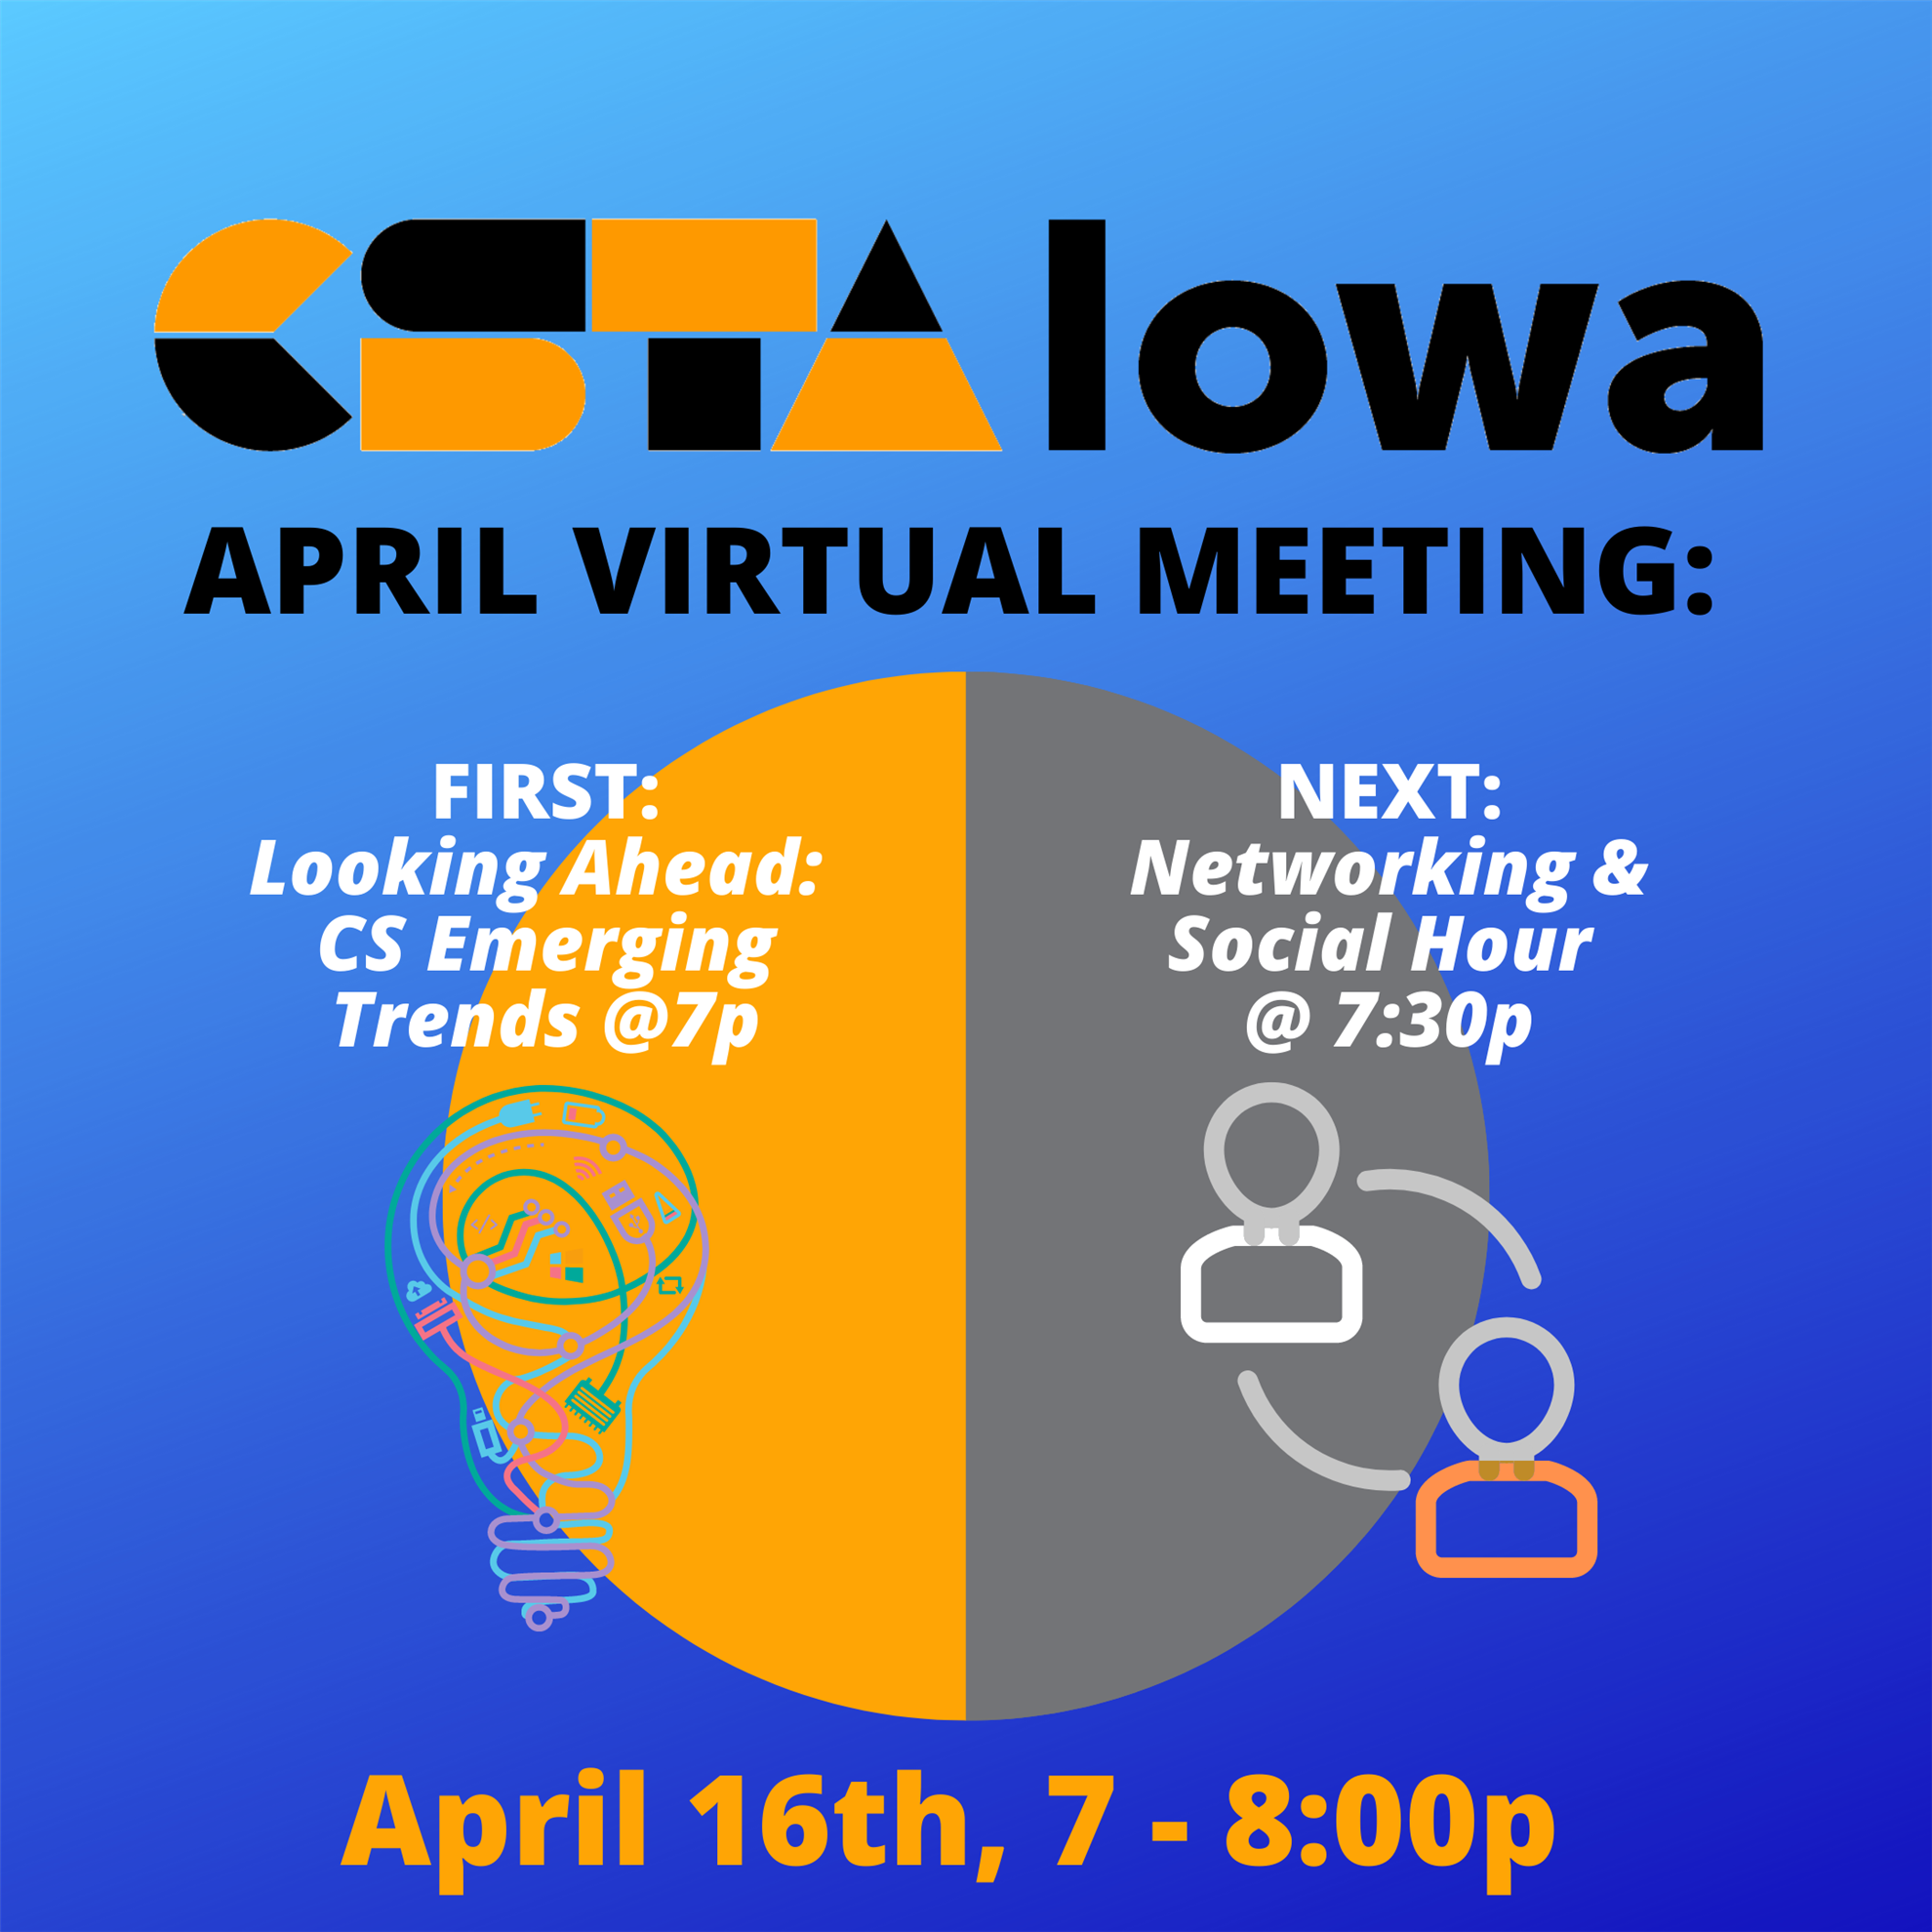 CSTA Iowa April Virtual Member Meeting & Social Hour (CSTA Iowa)